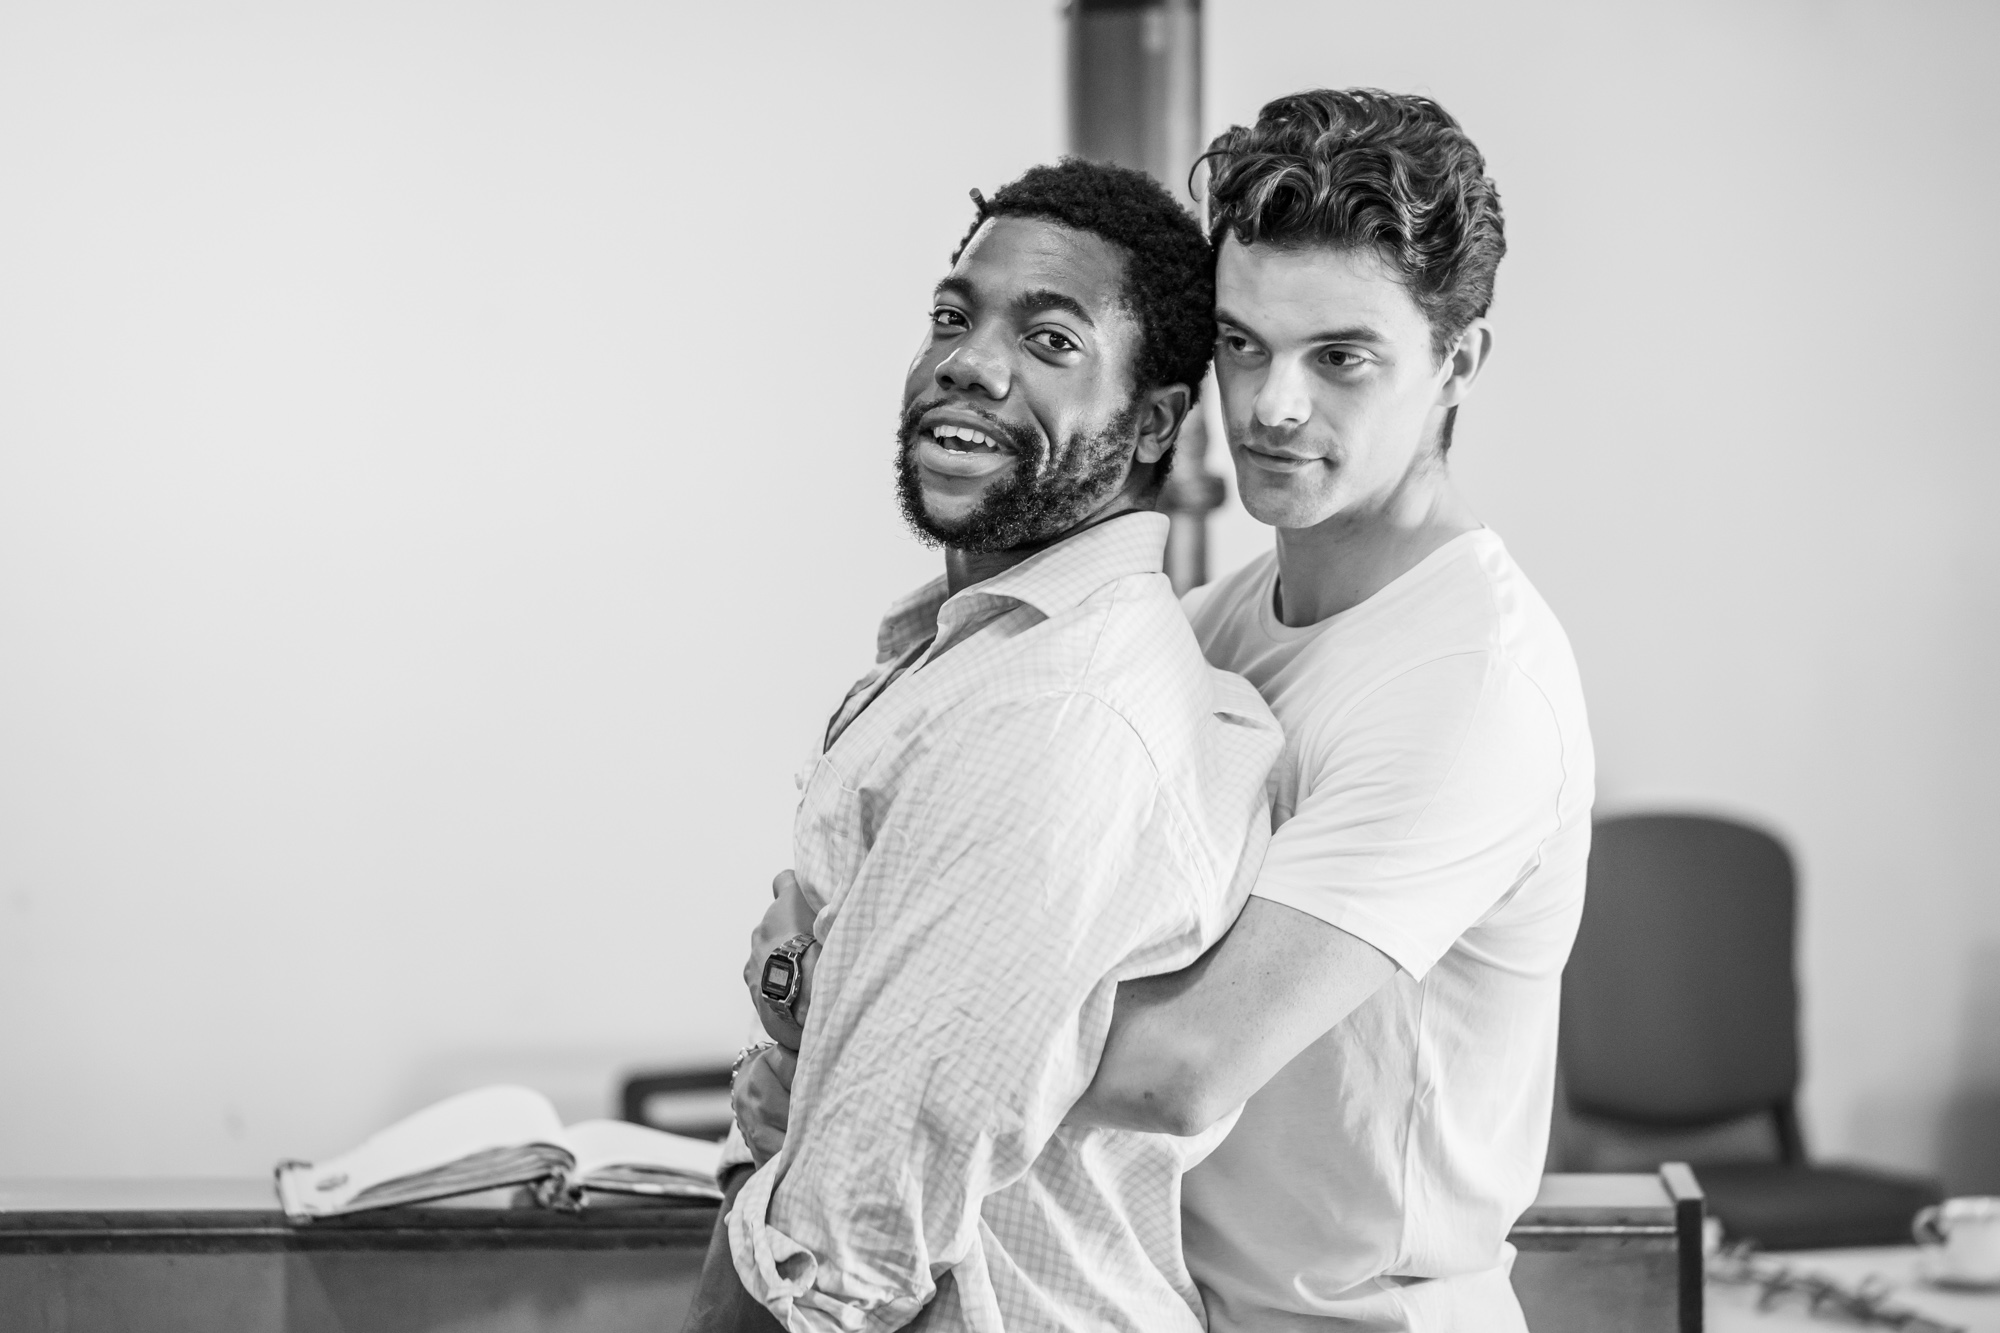 The Importance of Being Earnest • Vaudeville Theatre • Dir. Michael Fentiman